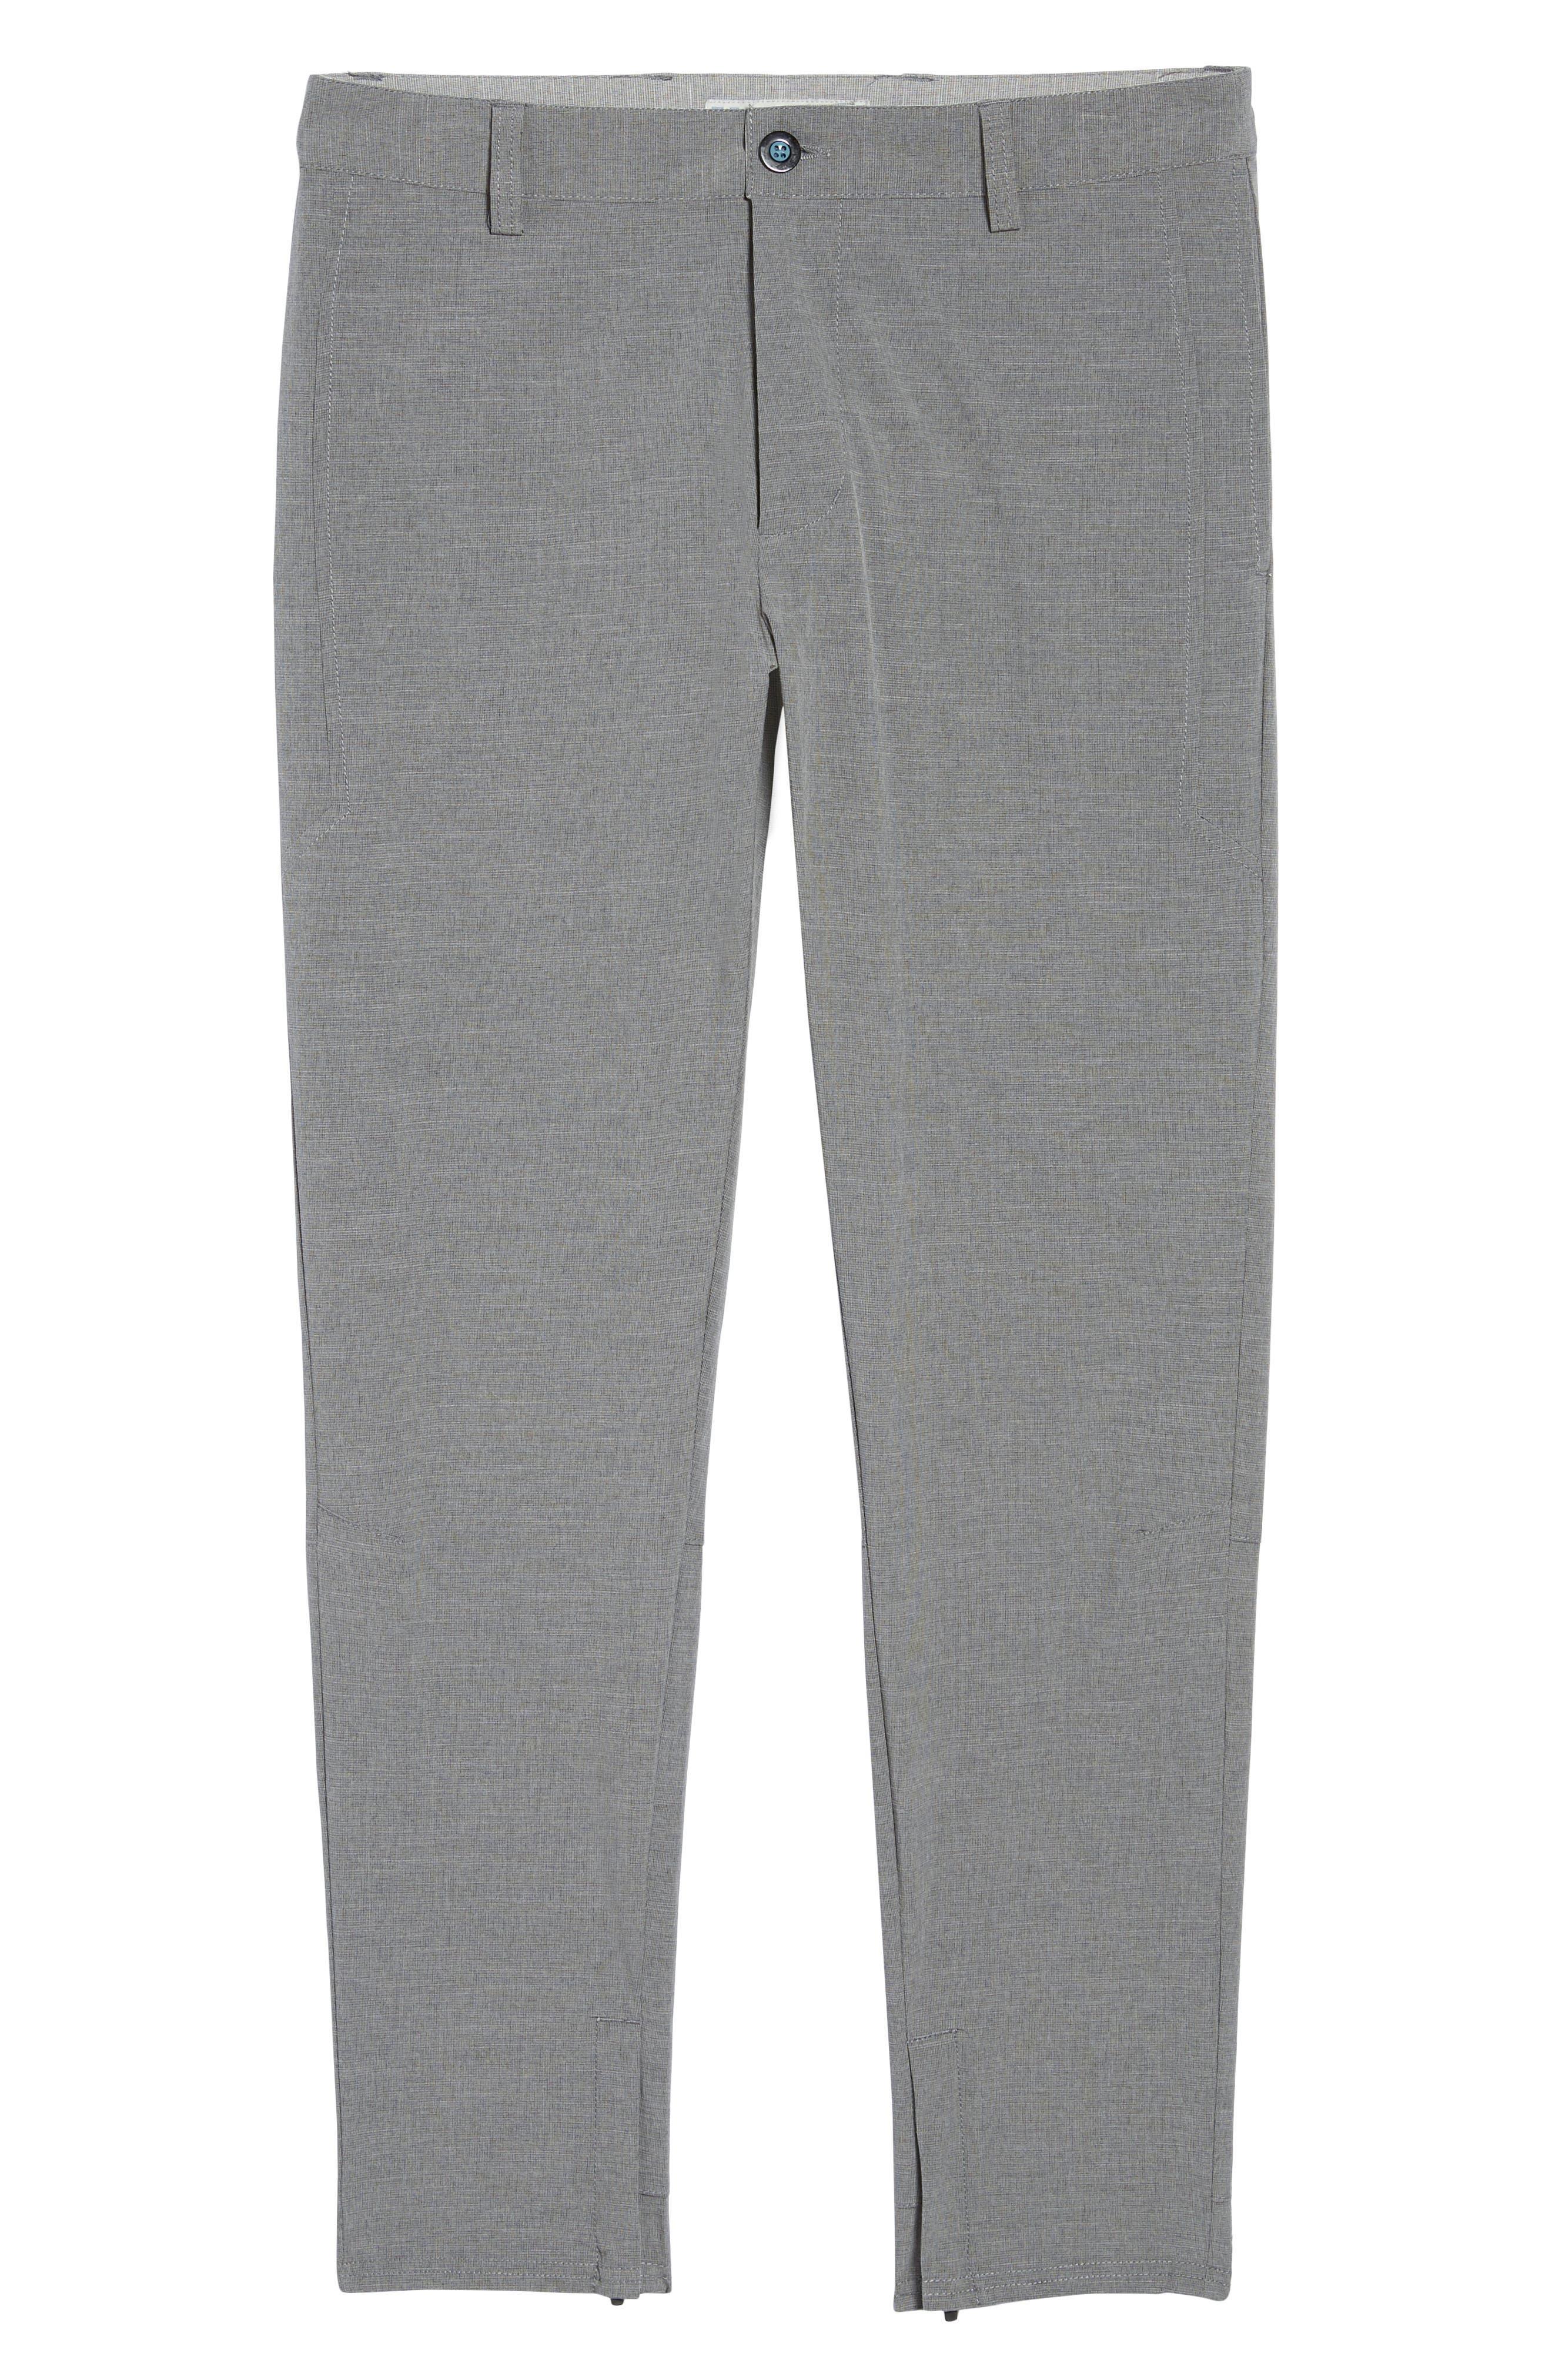 Gravity Athletic Fit Pants,                             Alternate thumbnail 6, color,                             Charcoal